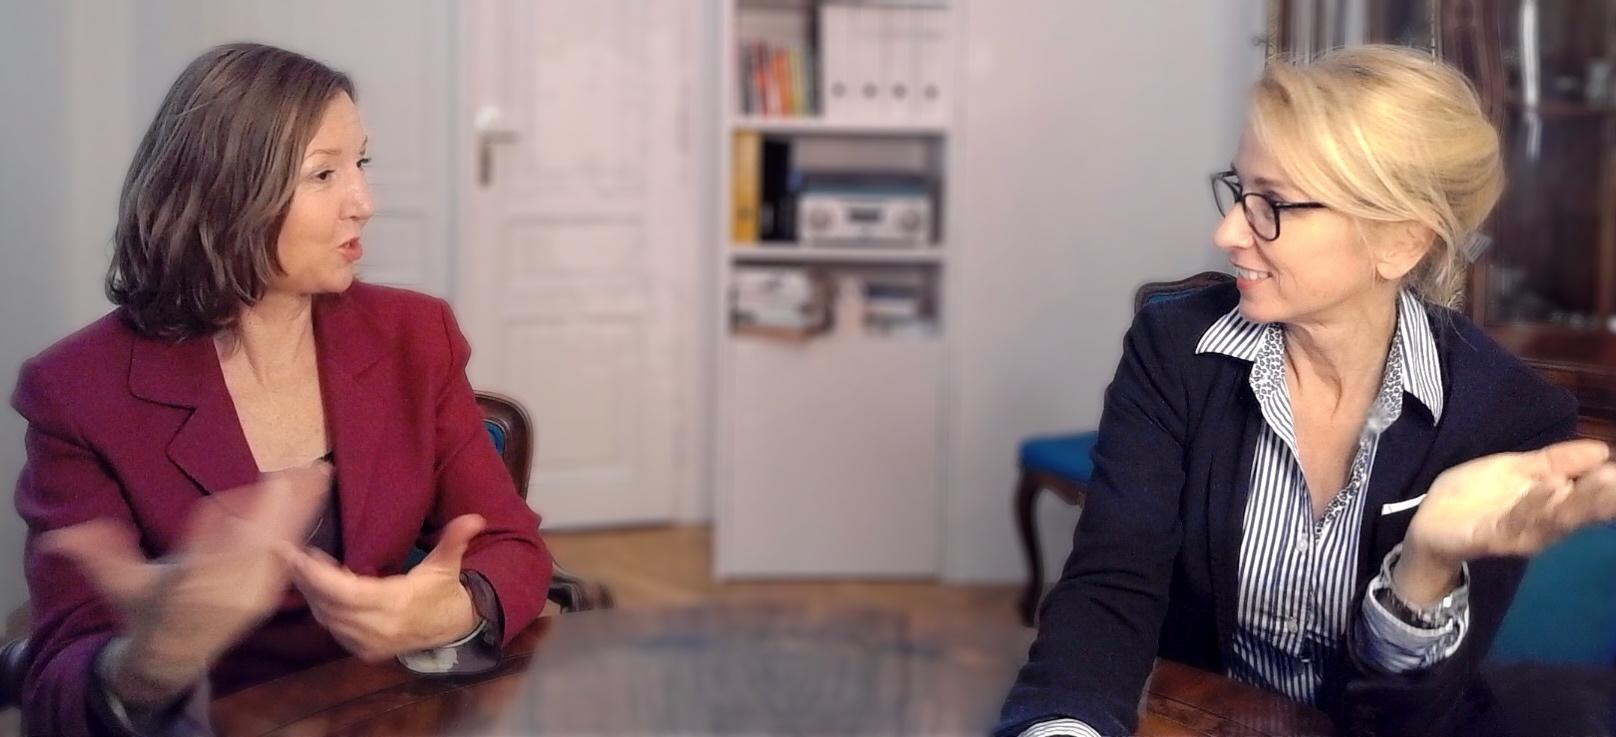 Johanna Eisenberger und Judith Girschik diskutieren